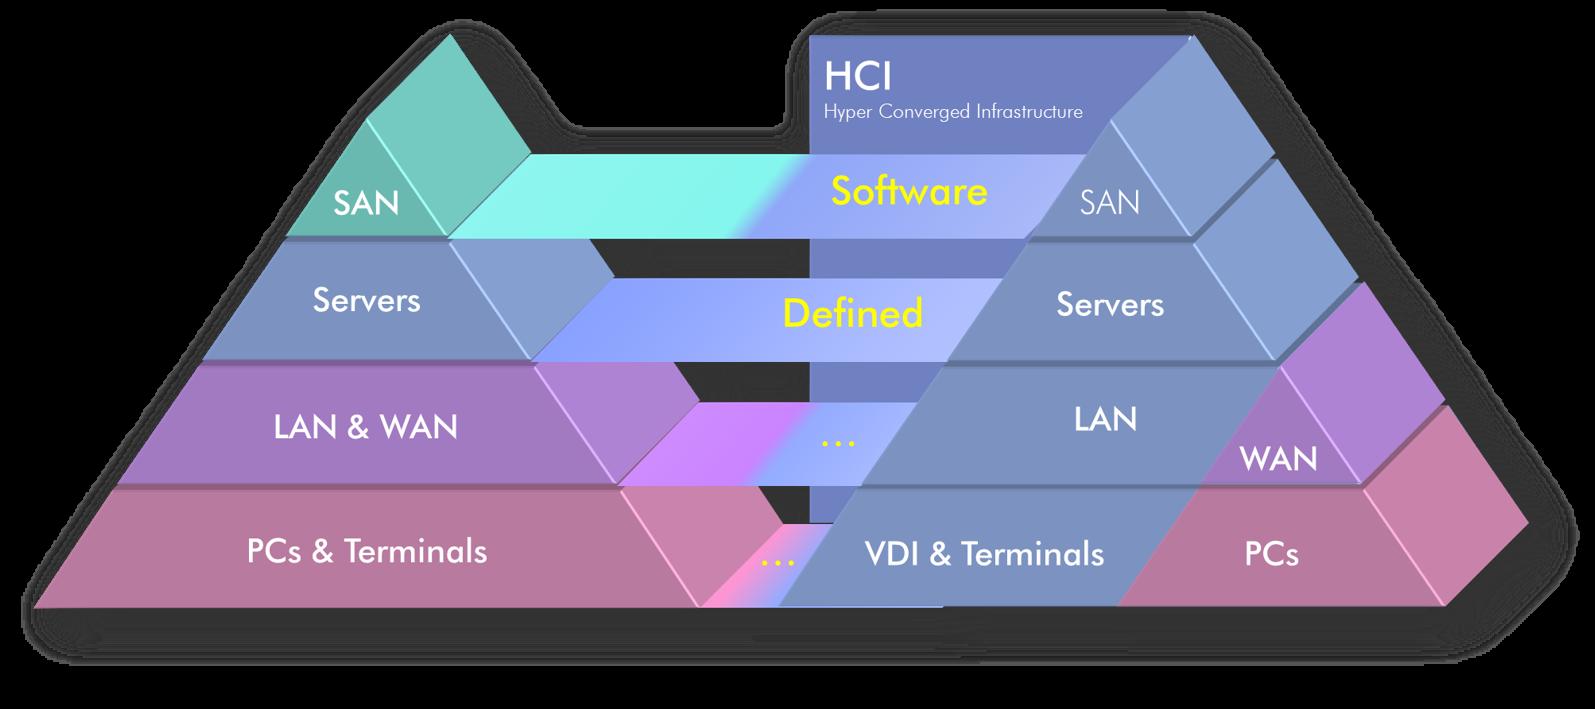 HCI - Hyper Converged Infrastructure